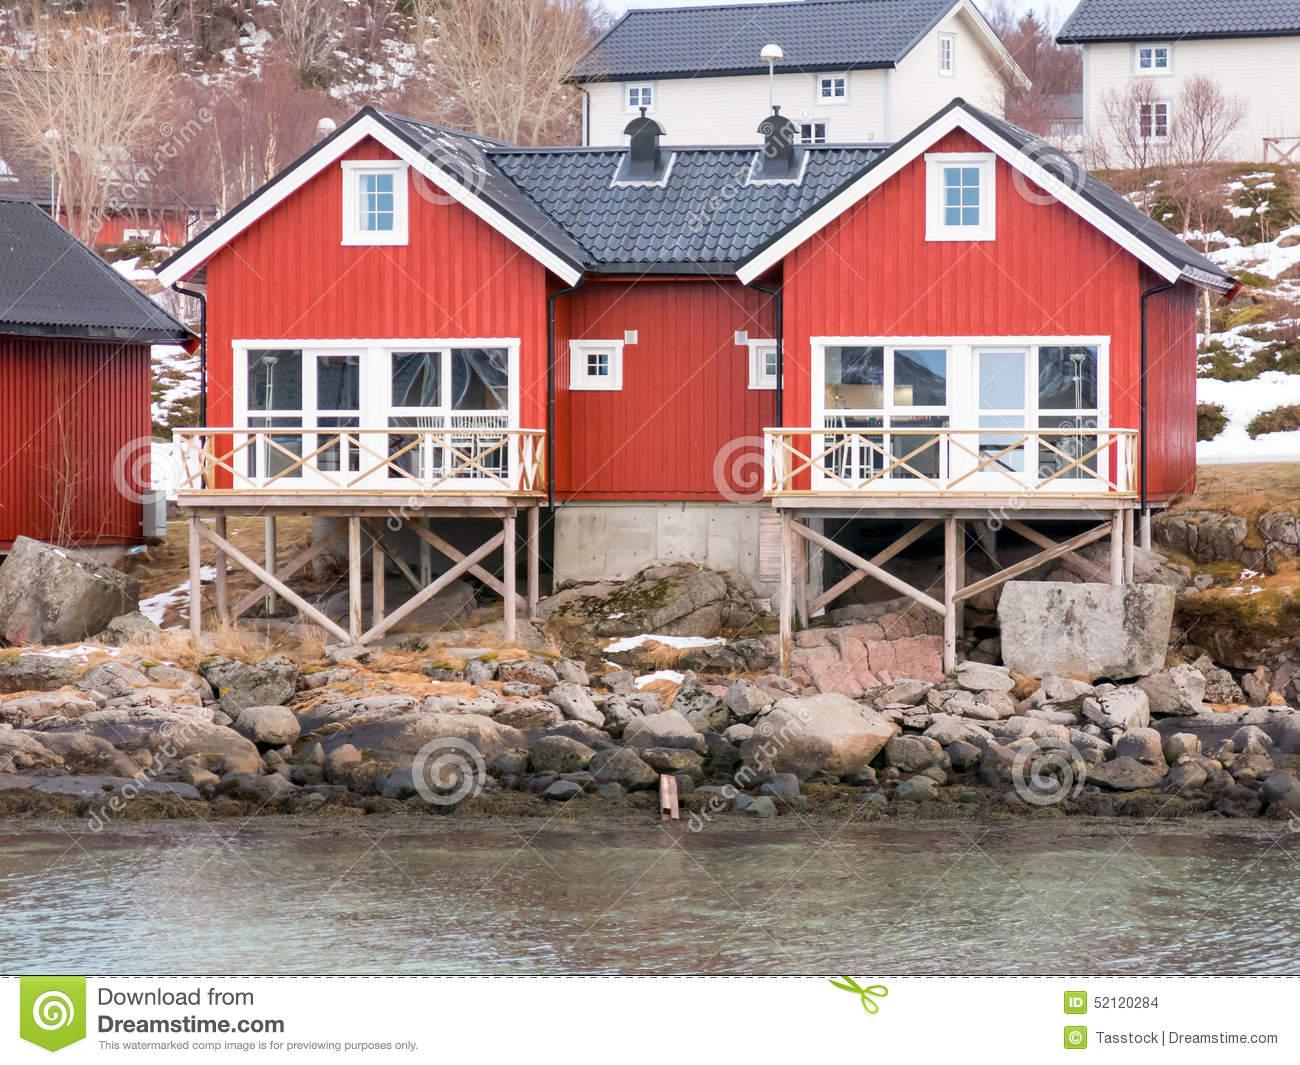 Rorbu Cabins In Stokmarknes, Vesteralen, Norway Stock Photo.